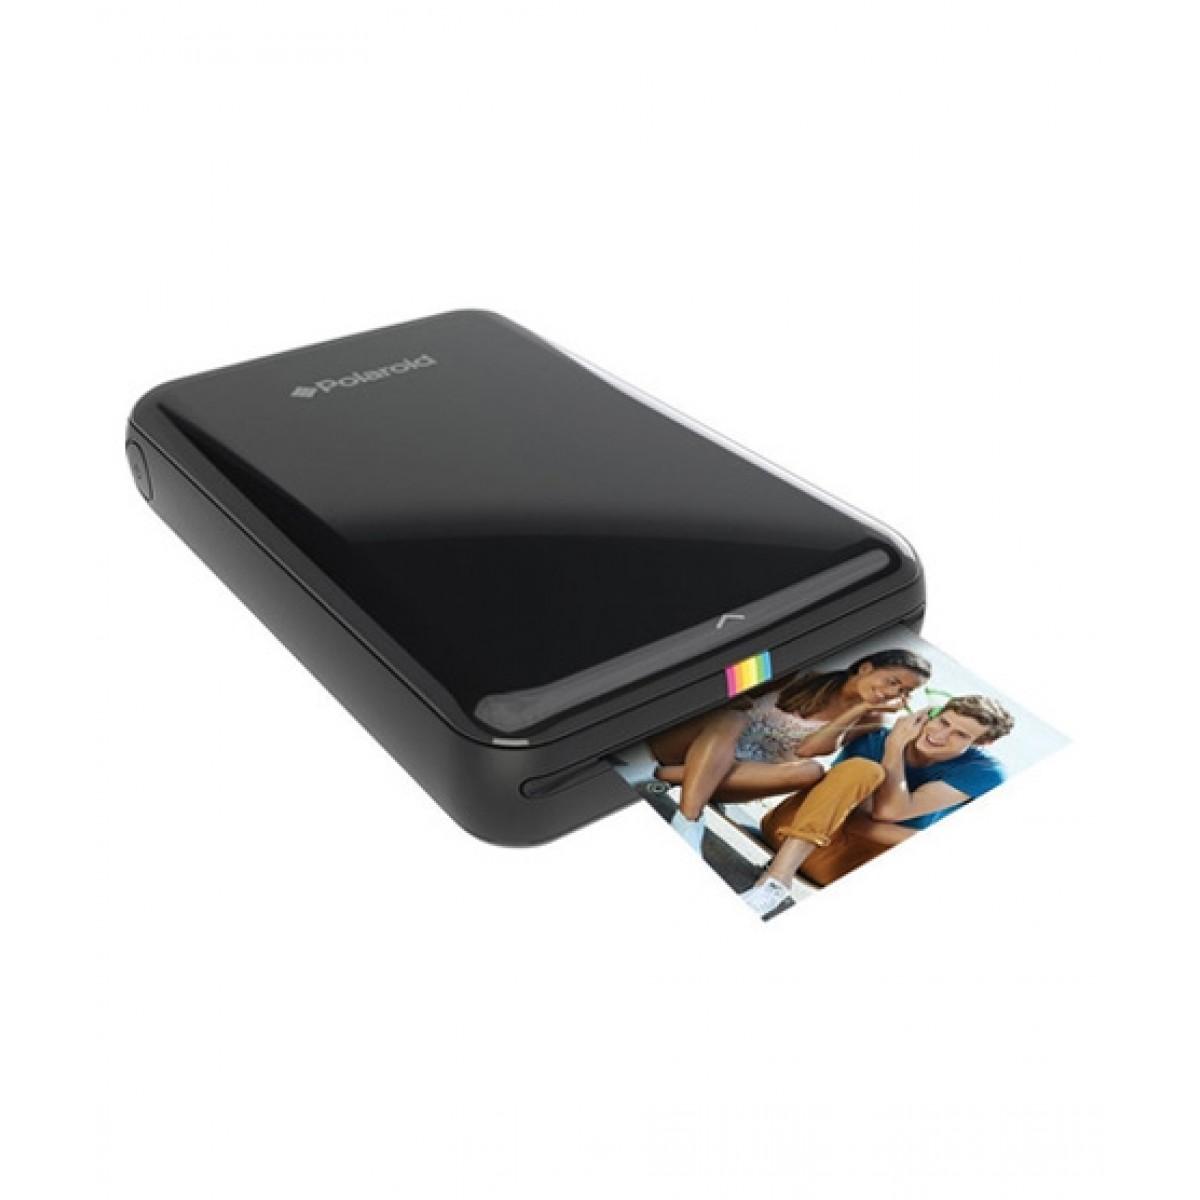 ea8b3e53c19b14 Polaroid ZIP Mobile Printer Kit Price in Pakistan | Buy Polaroid Mobile  Printer Kit Black With 50 Sheets | iShopping.pk